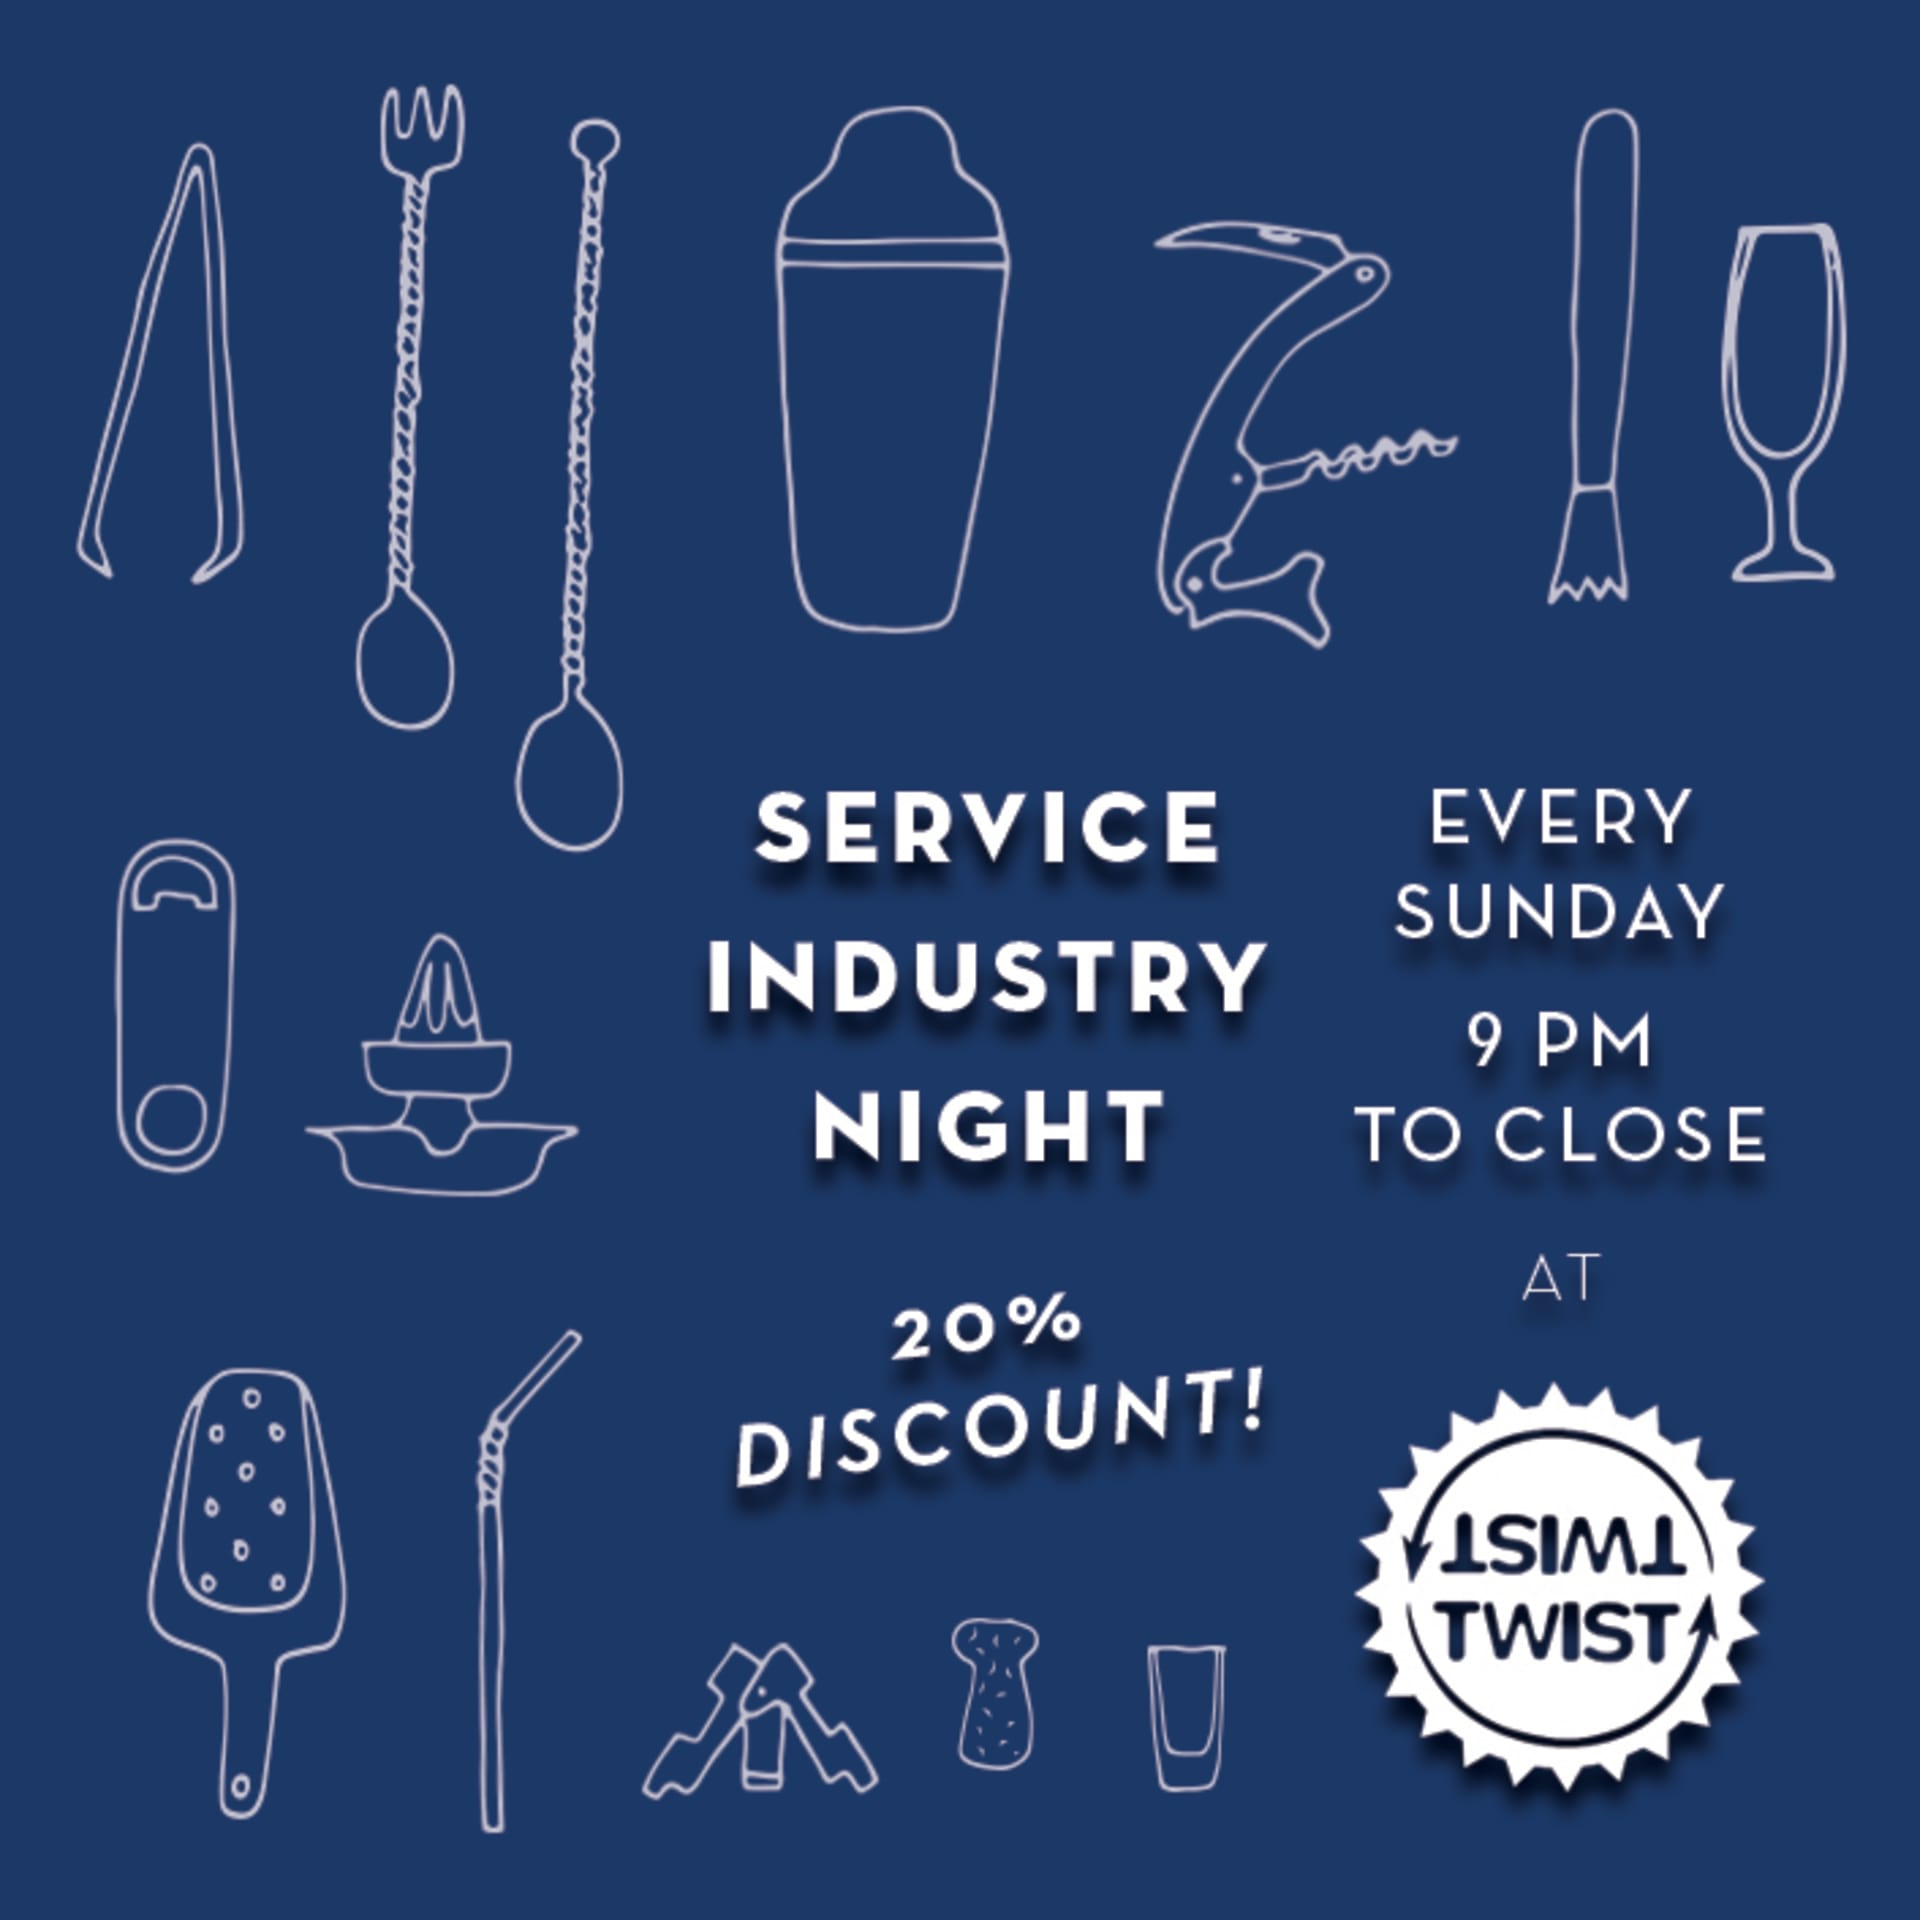 Sunday - Service Industry Night